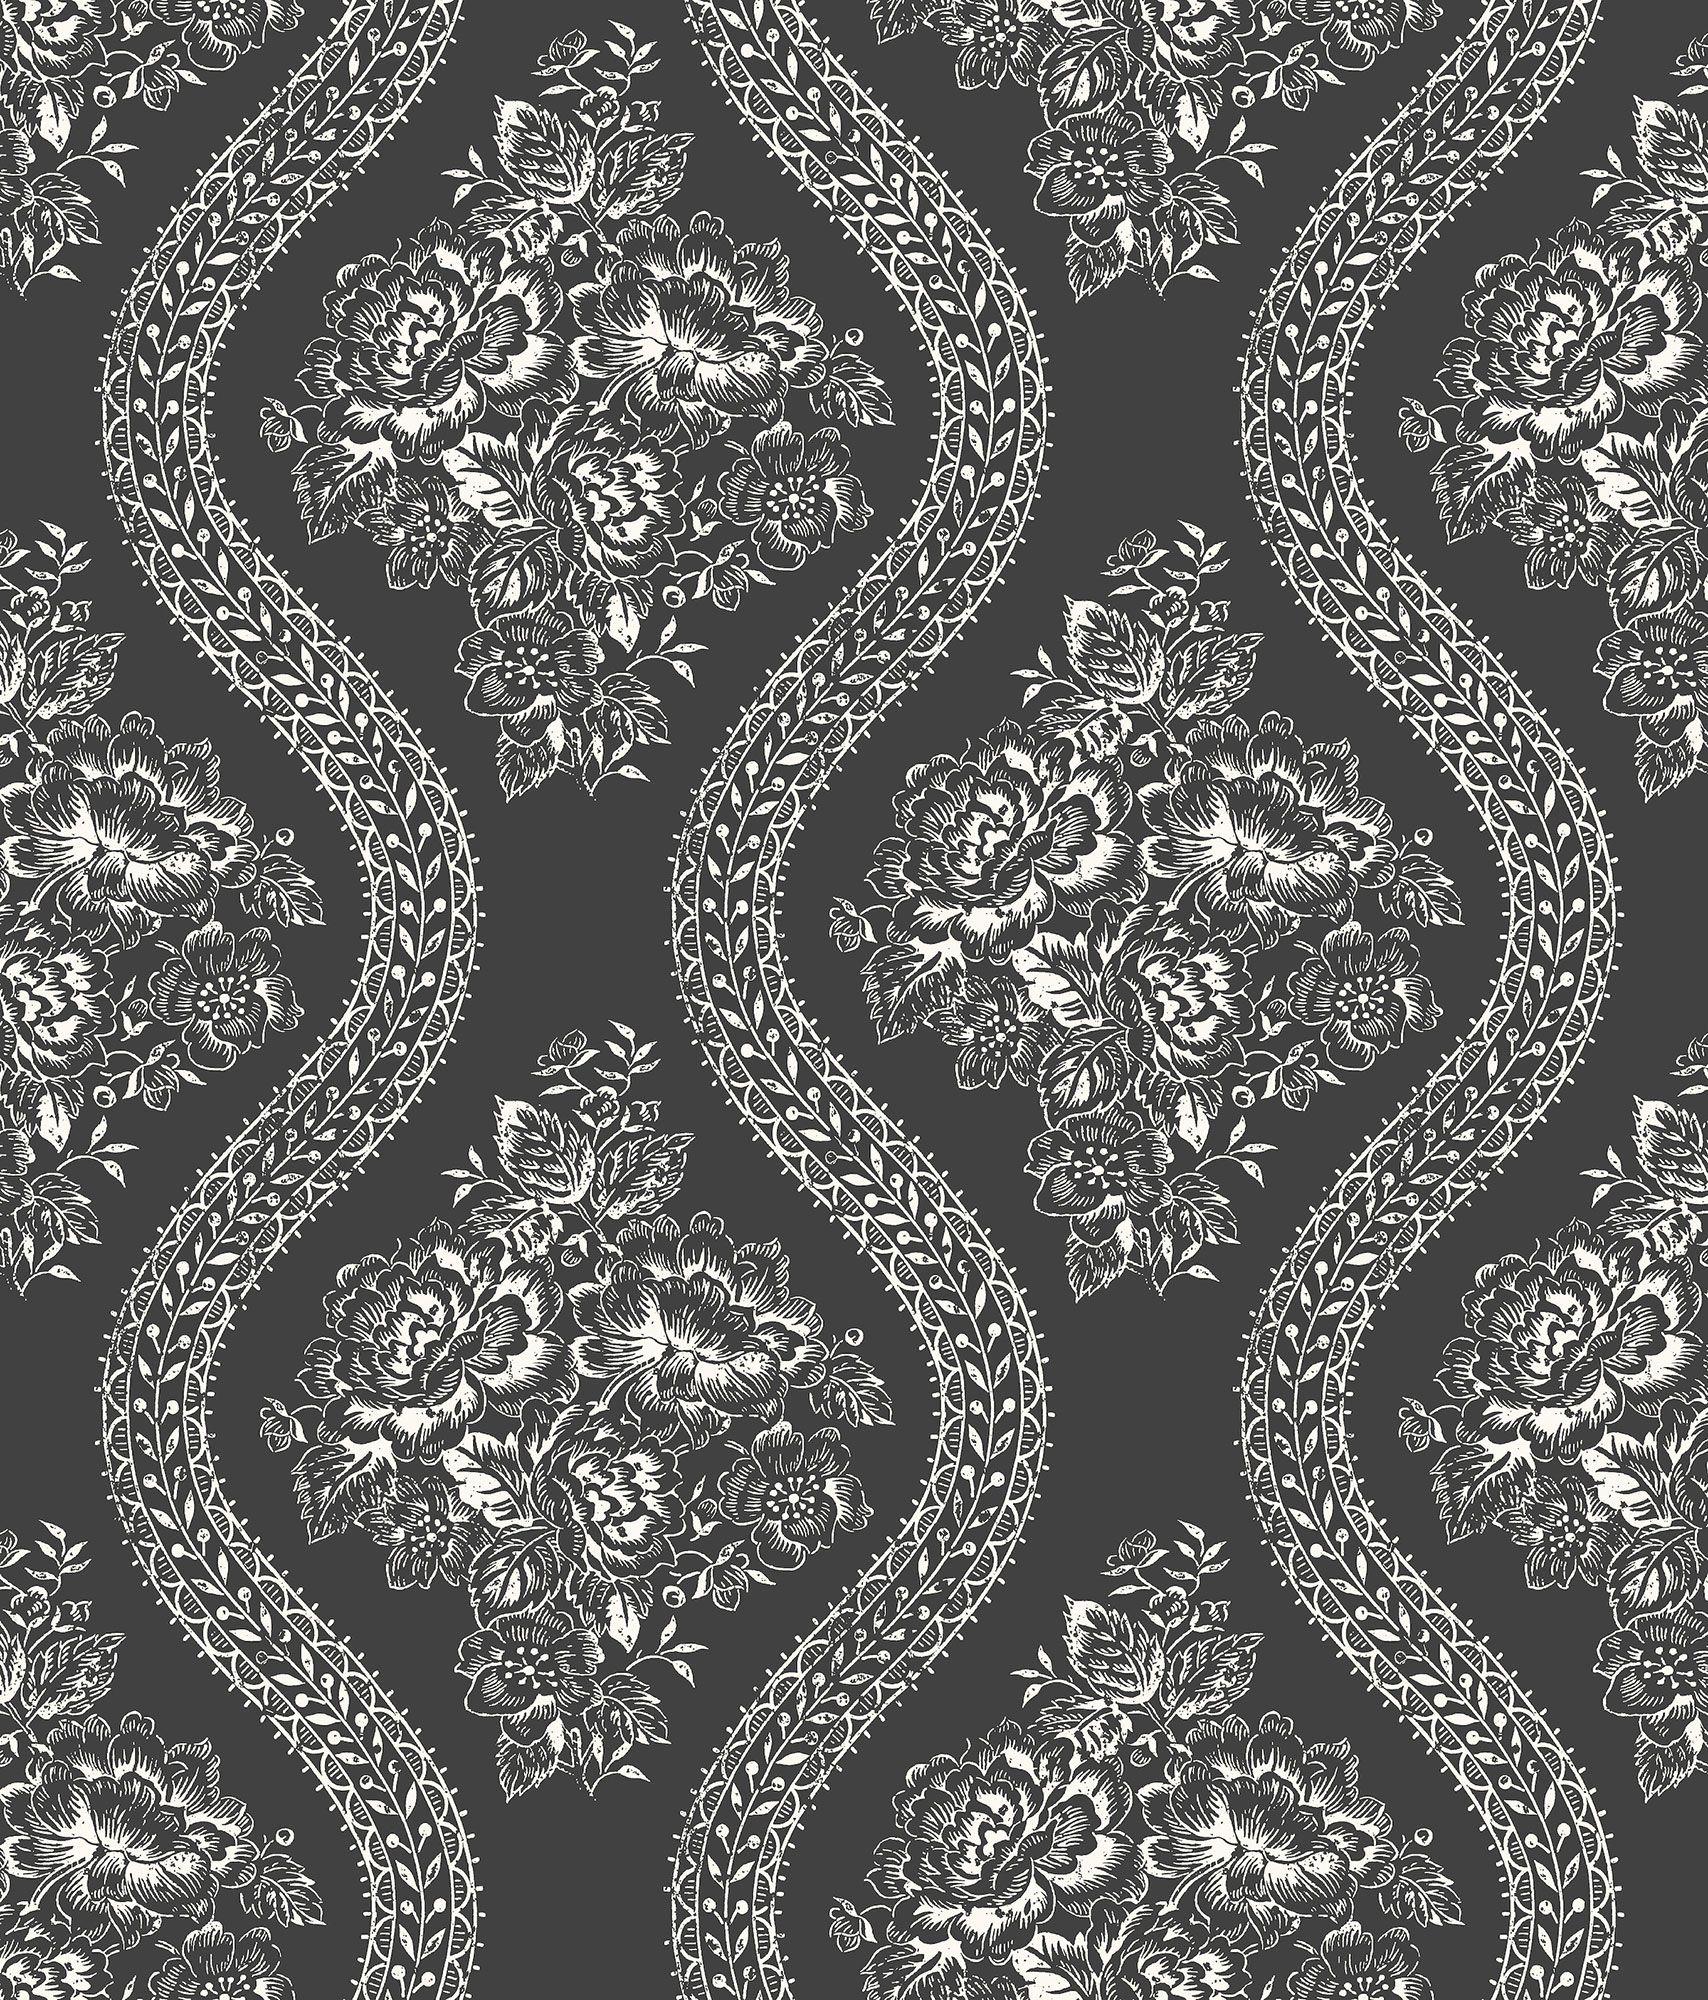 Magnolia Home Coverlet Floral Wallpaper Black & White